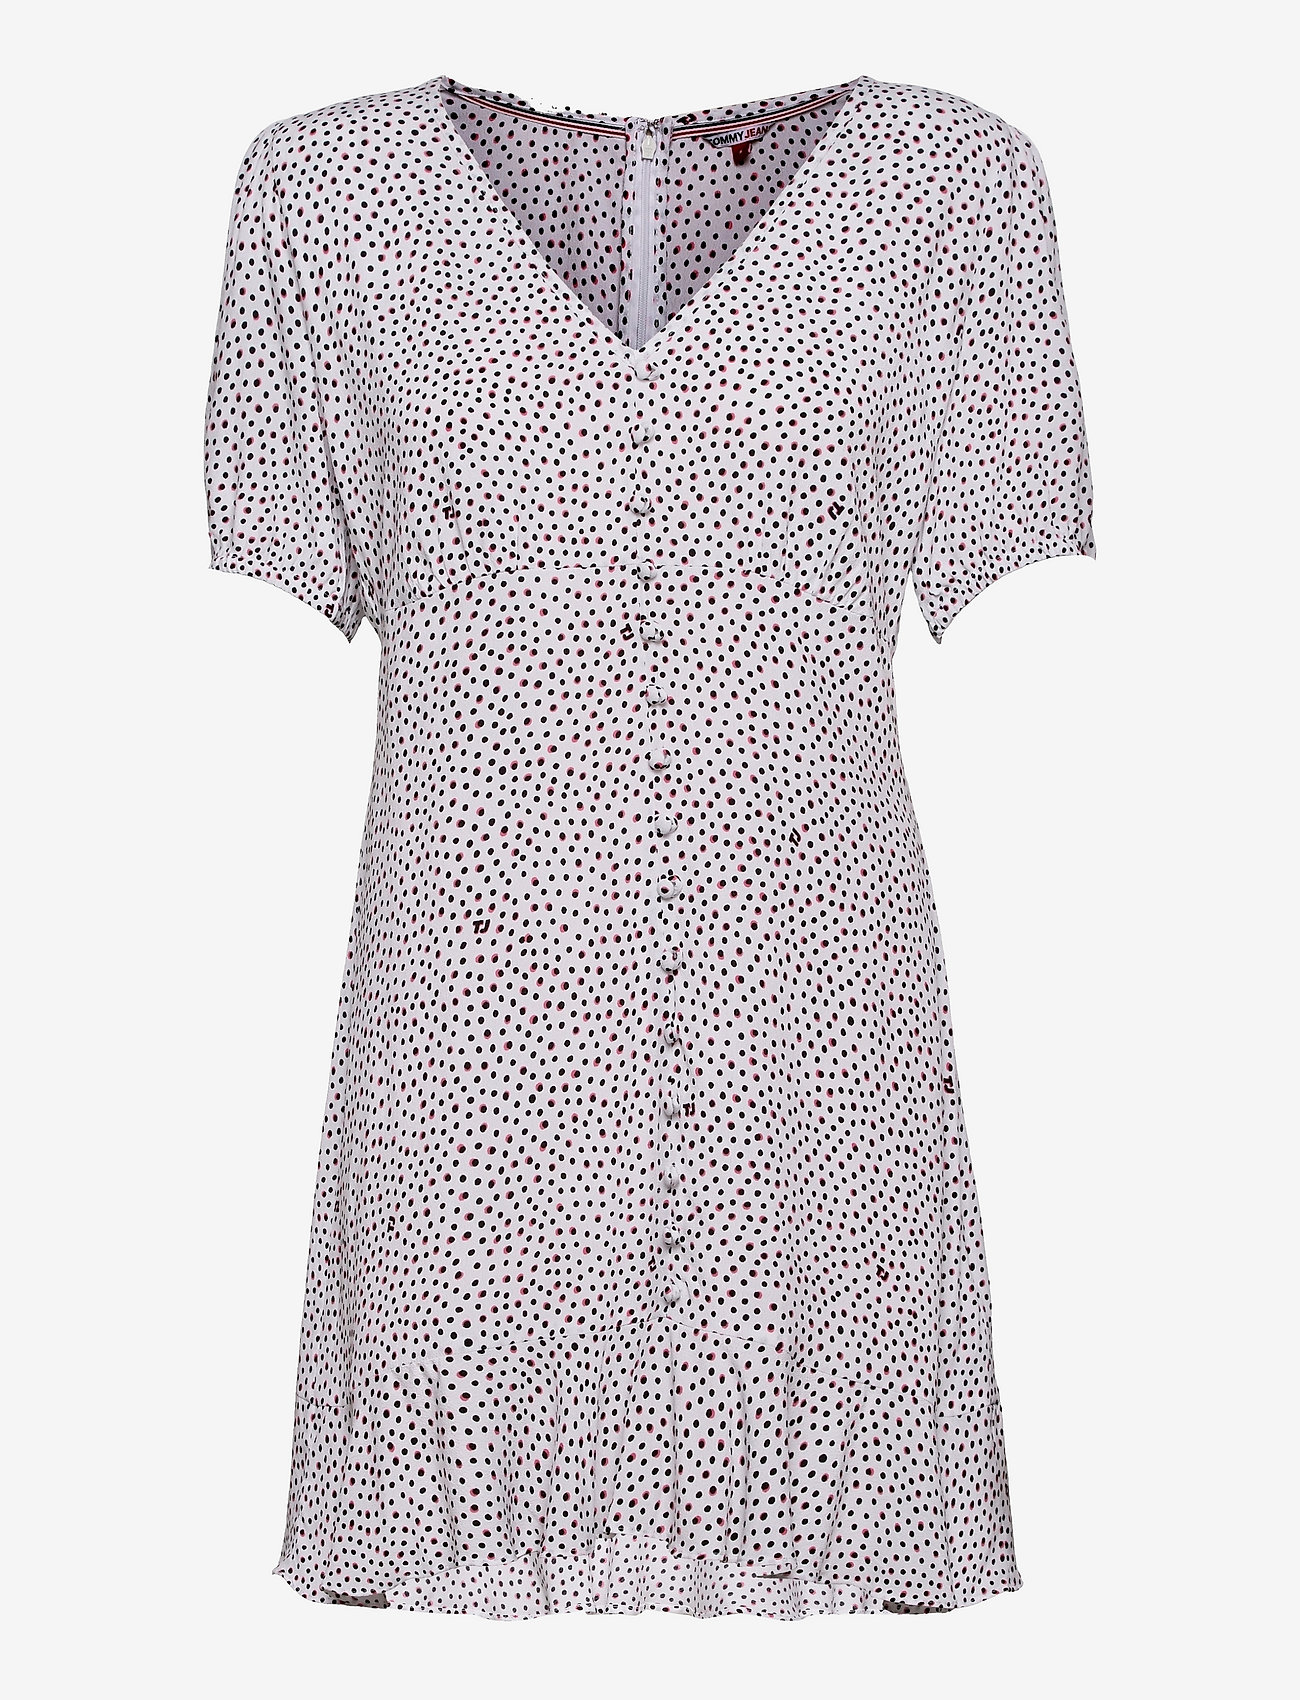 Tommy Jeans - TJW PRINTED BUTTON THRU DRESS - summer dresses - dot print - 0